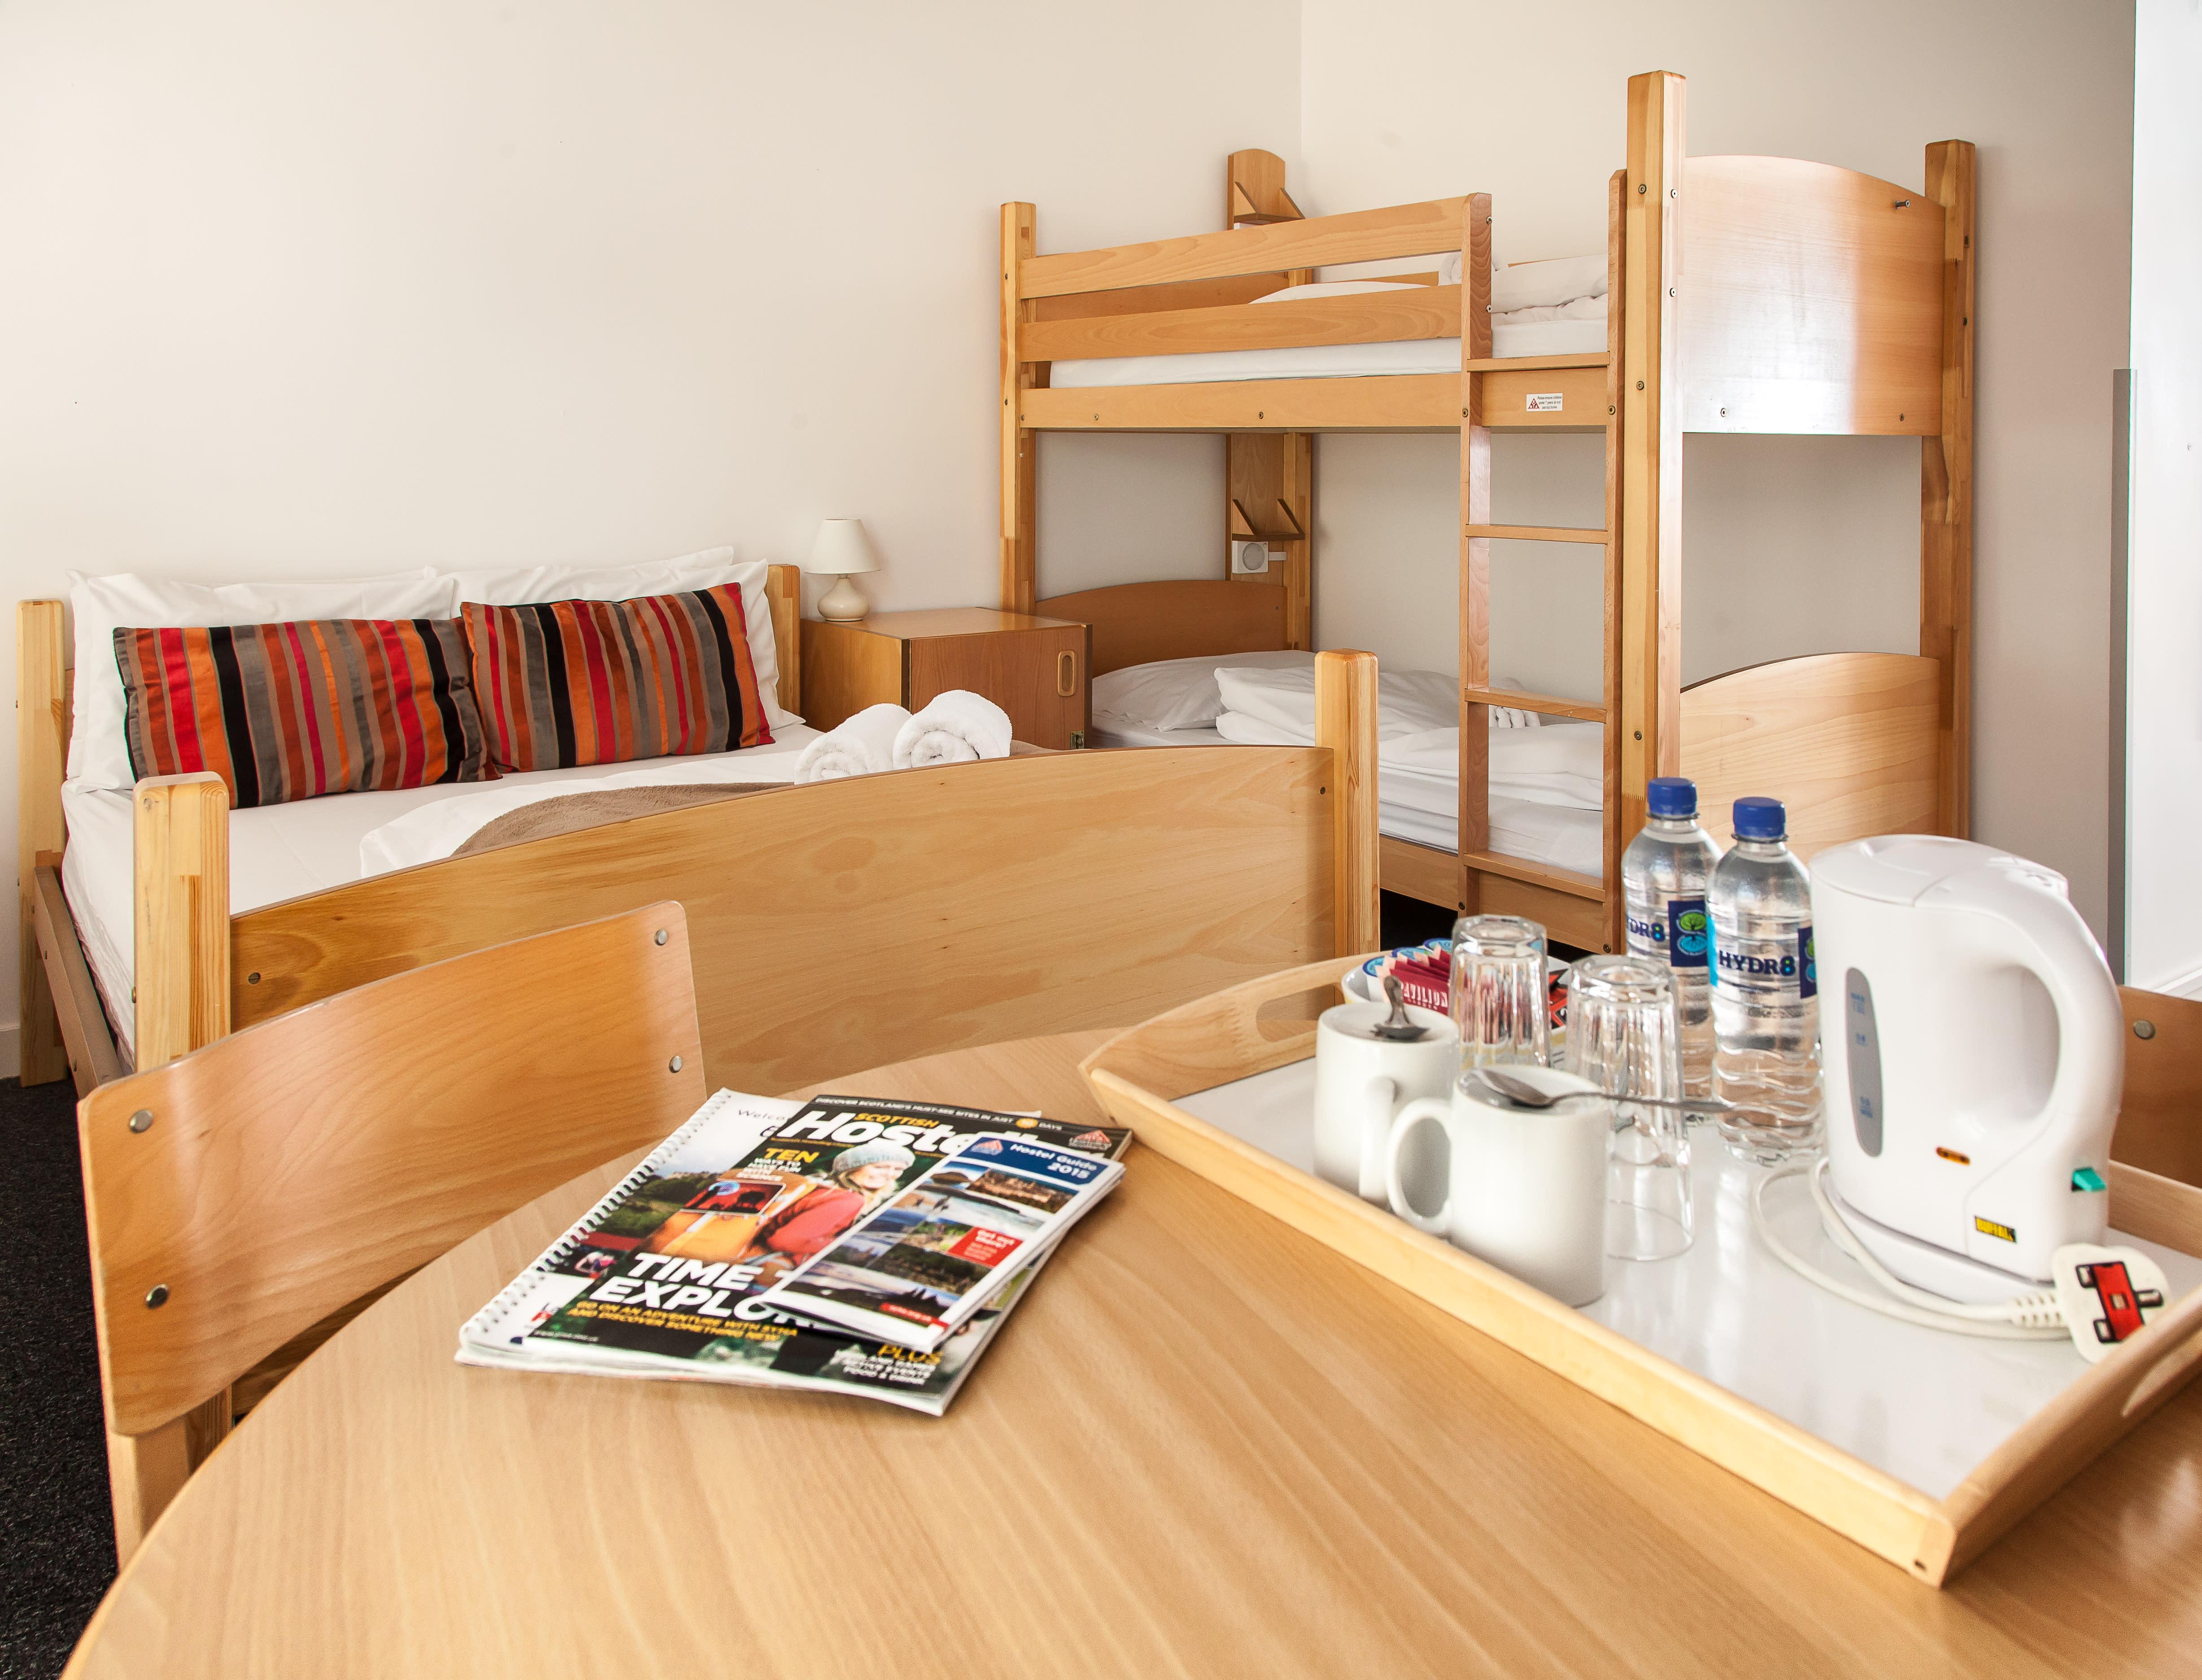 HOSTEL - Edinburgh Central Youth Hostel